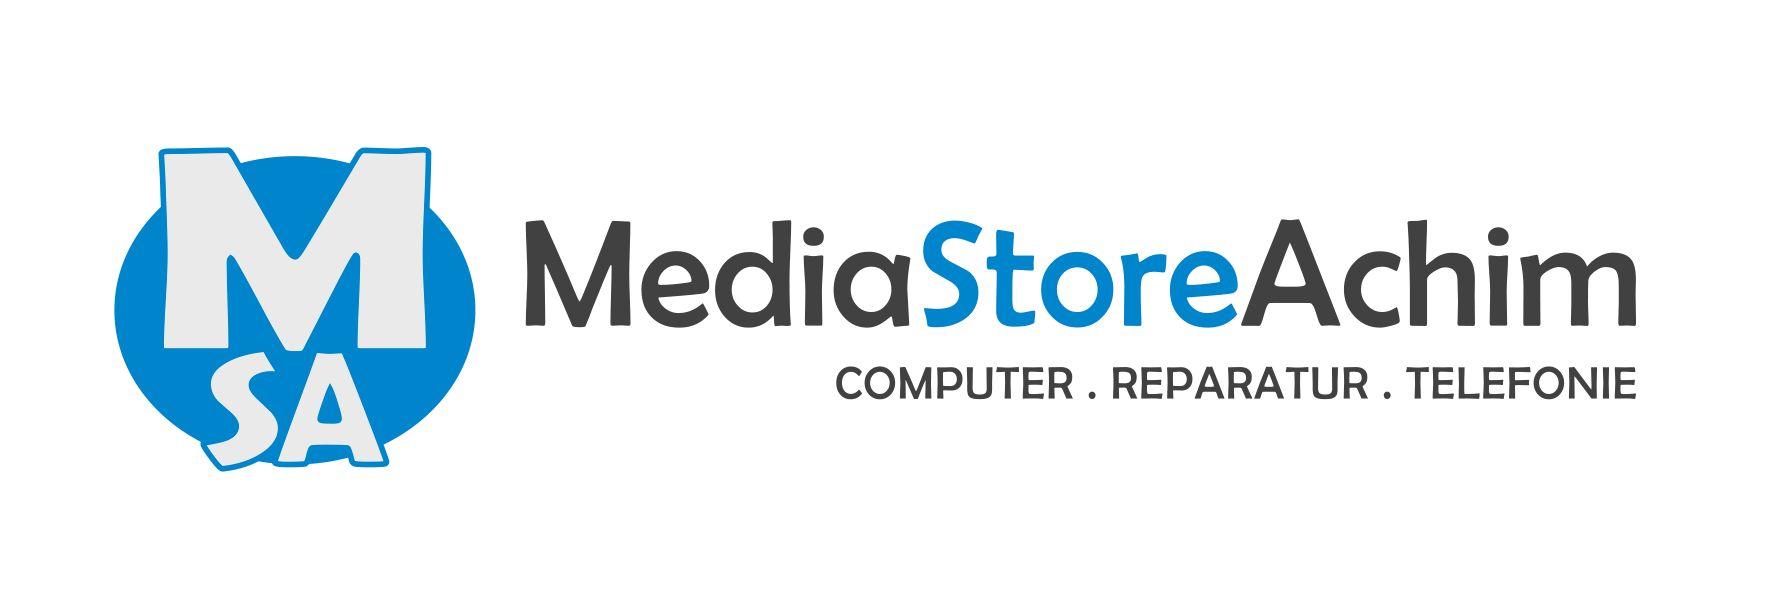 Media Store Achim